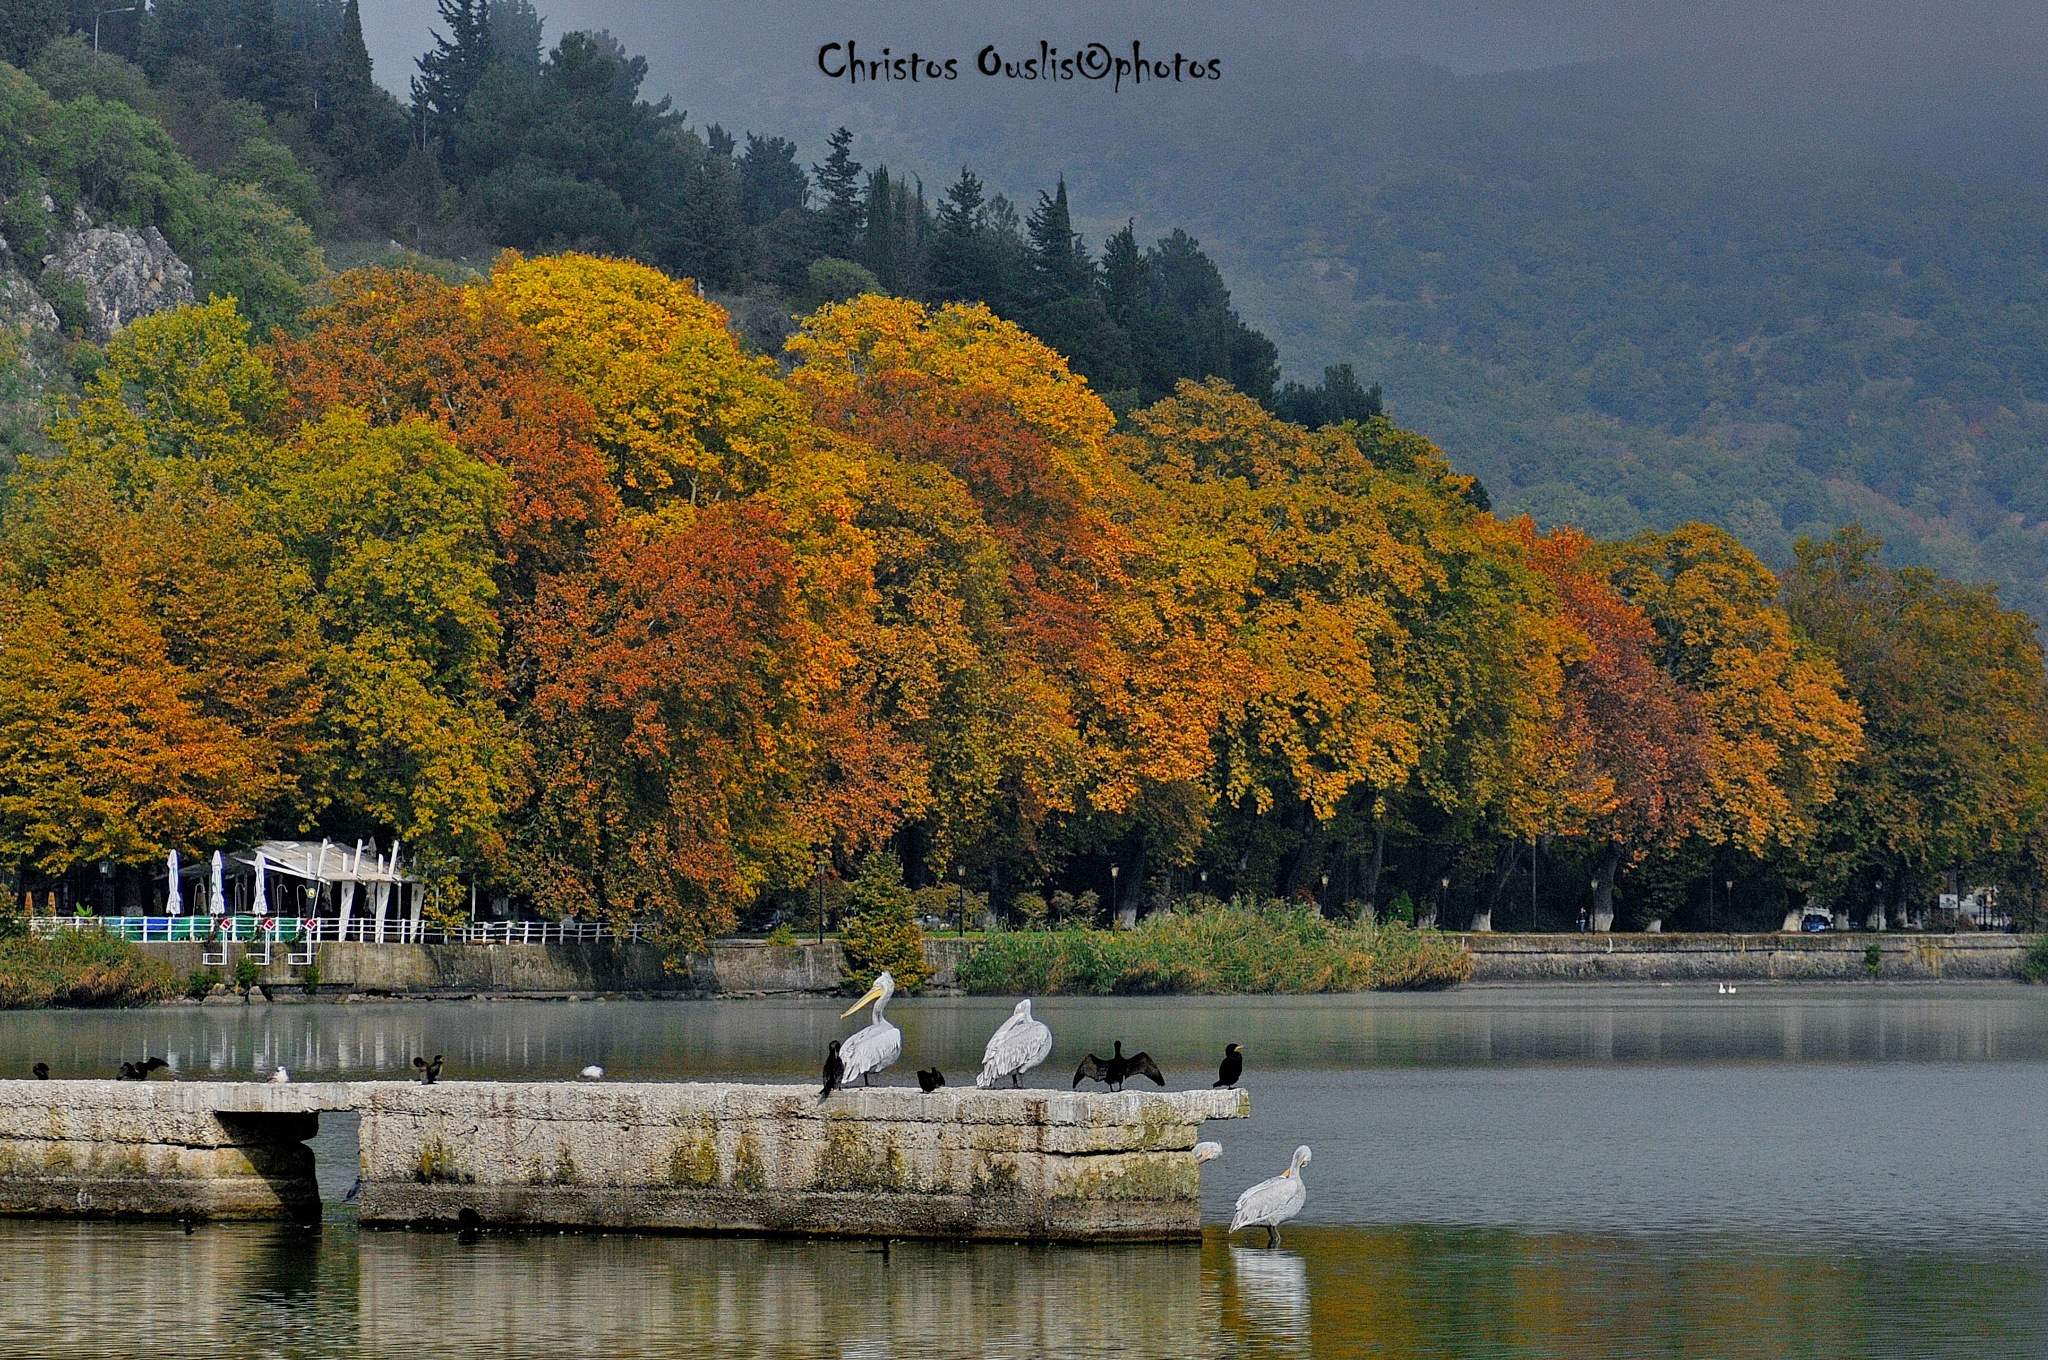 autumn colors on lake by Christos Ouslis